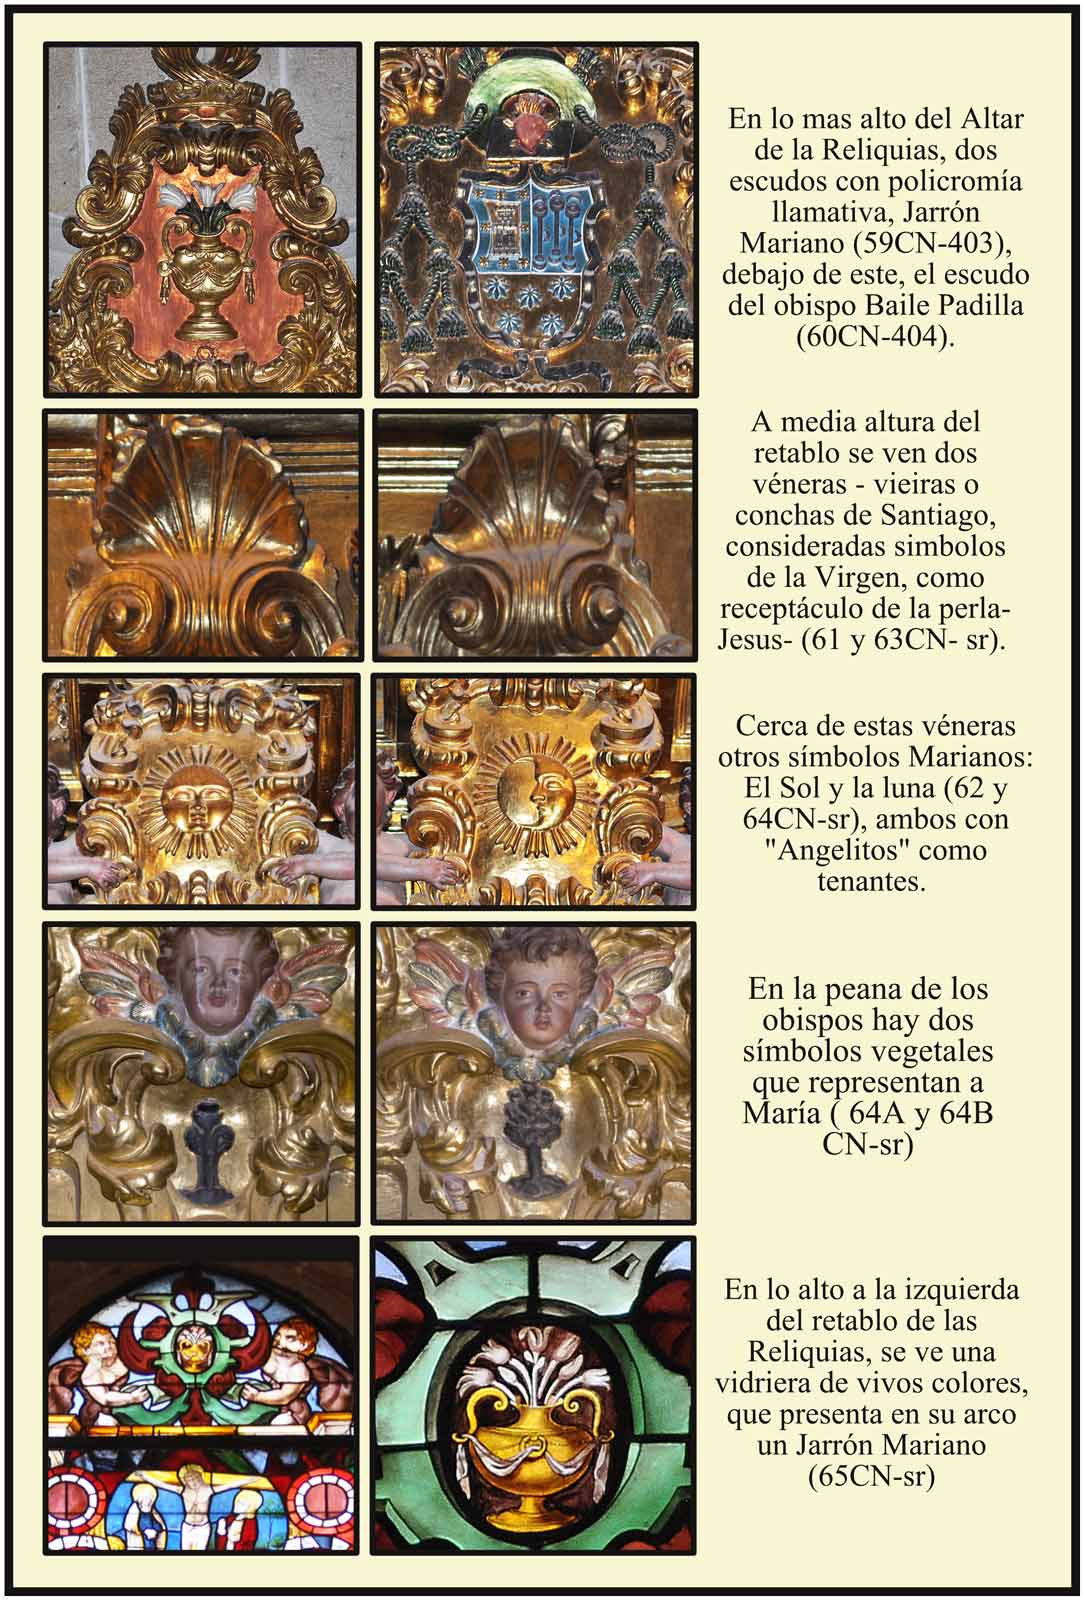 Catedral Plasencia Altar de las Reliquias Escudo del Obispo Padilla simbolos marianos